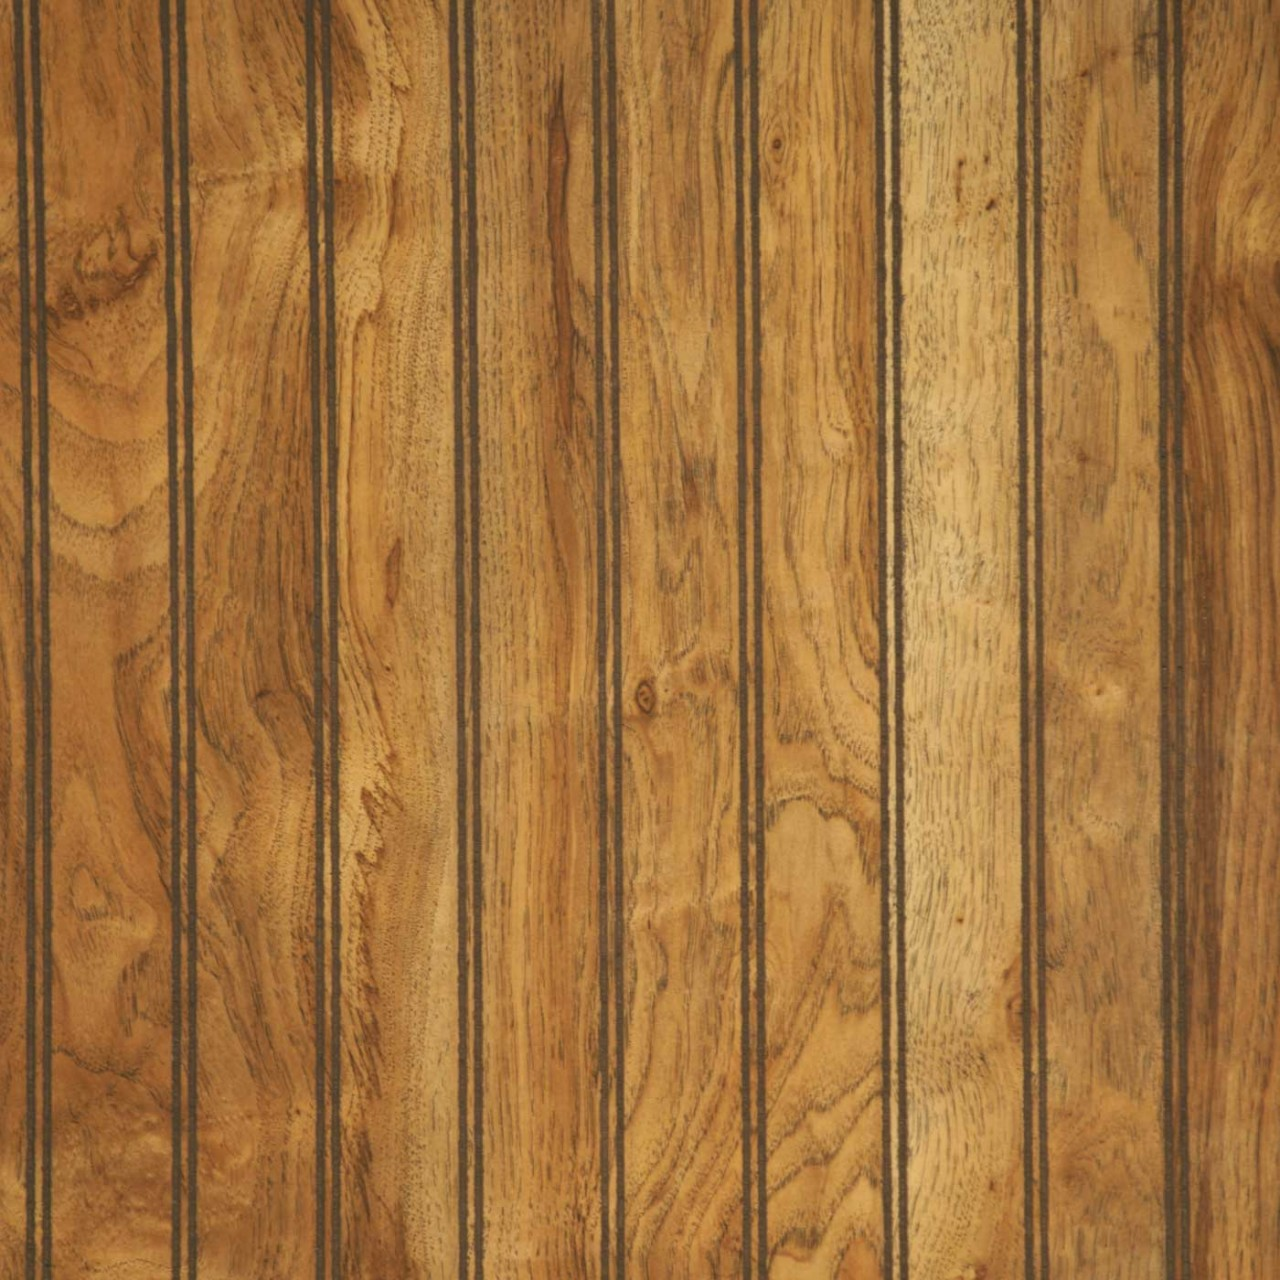 Paneling Wall Paneling Wood Paneling For Walls 1280x1280